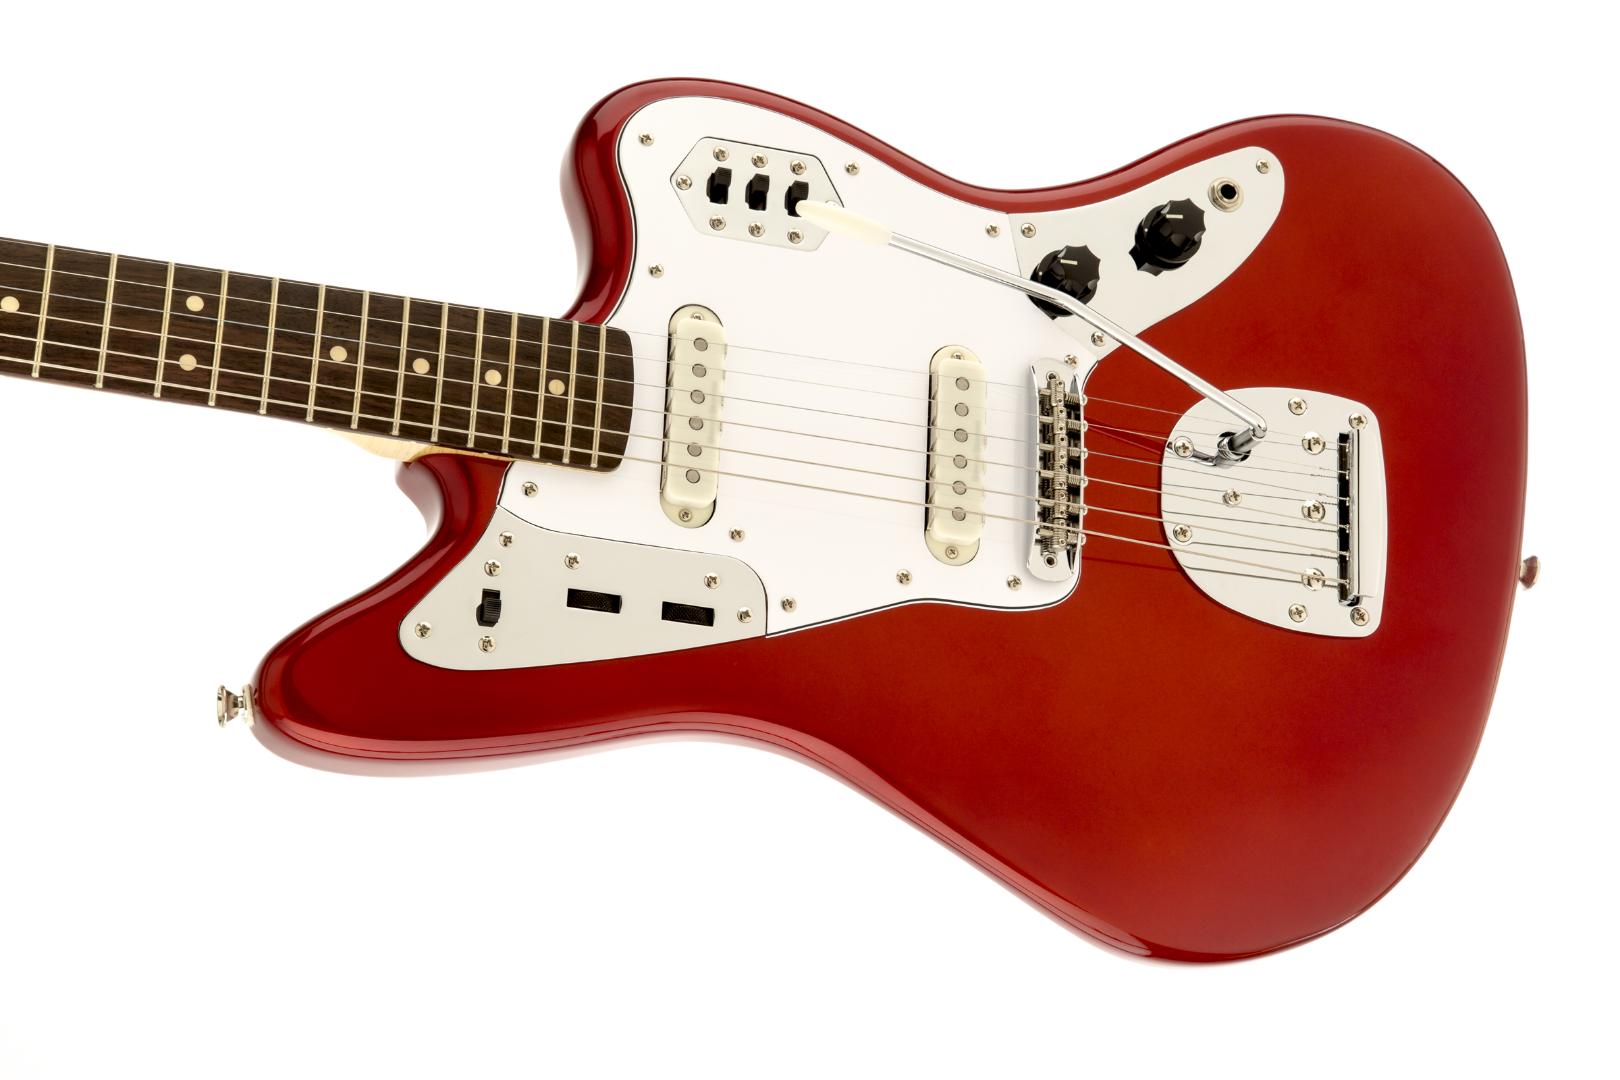 squier vintage modified jaguar electric guitar candy apple red w rosewood board 885978225194 ebay. Black Bedroom Furniture Sets. Home Design Ideas